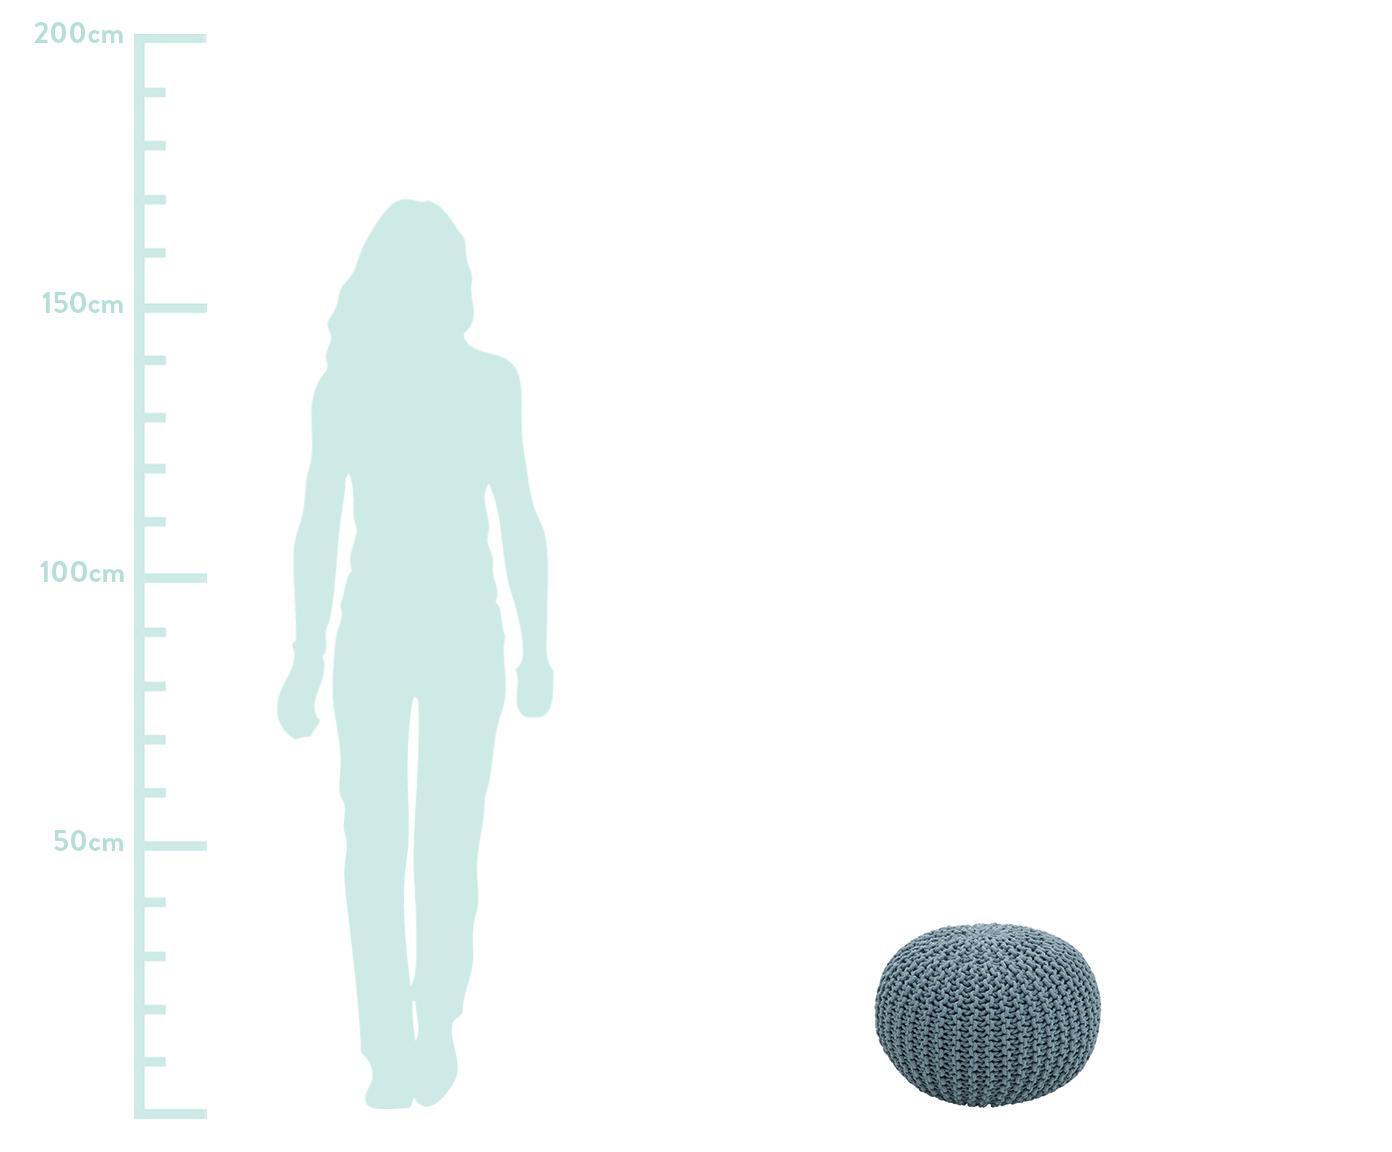 Handgefertigter Strickpouf Dori, Bezug: 100% Baumwolle, Petrol, Ø 55 x H 35 cm